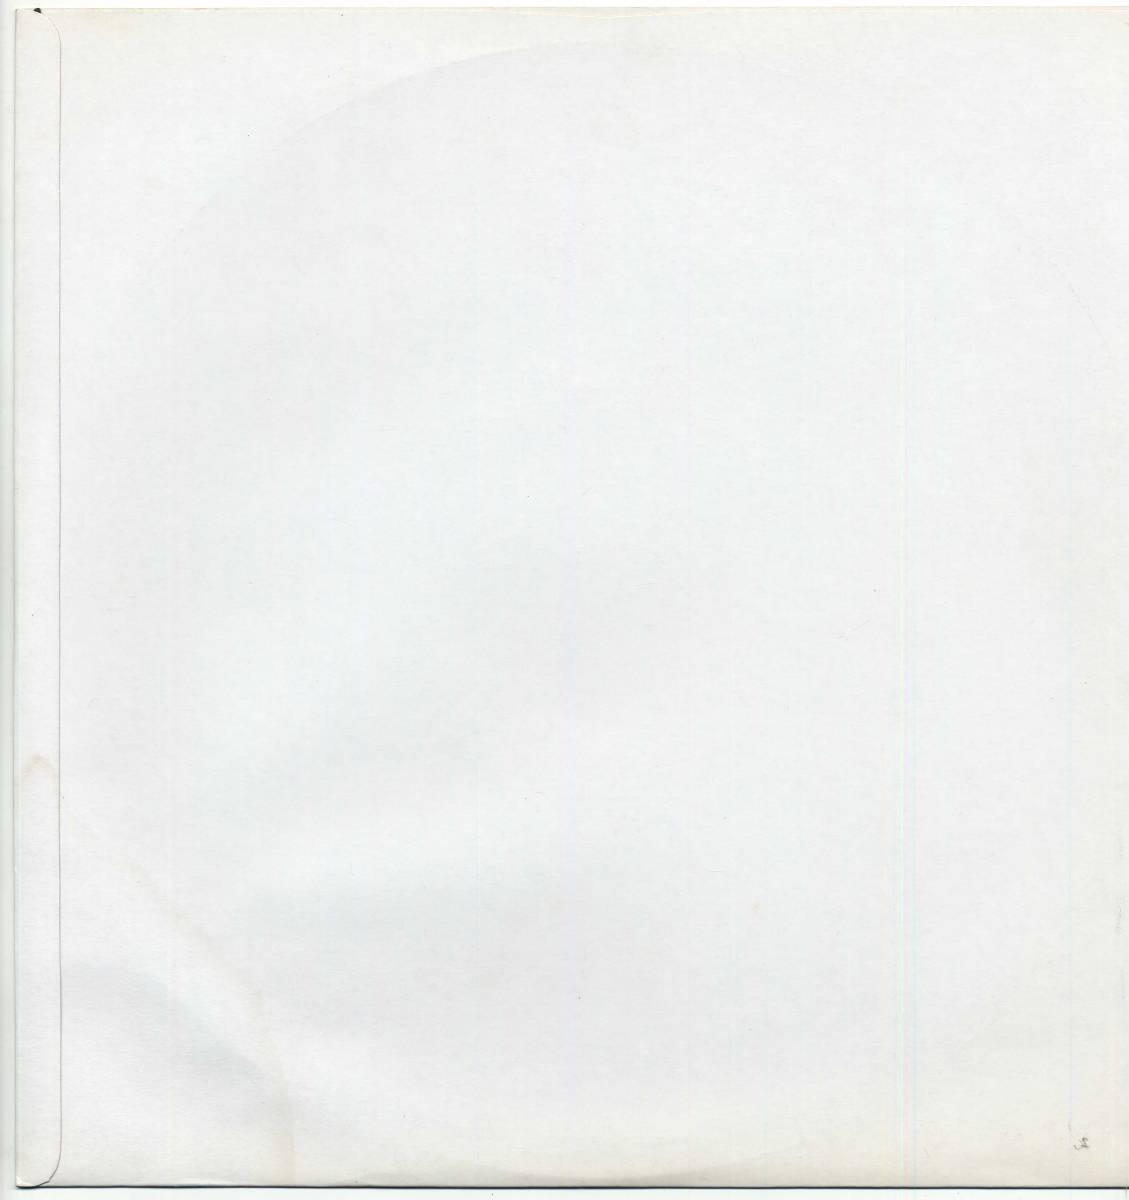 LP★INU他/DOKKIRI RECORDドッキリレコード:自主盤赤JK/町田町蔵★ULTRA BIDE,ALCOHOL42%,変身キリン,CHINESE CLUB/a-7713/限定200枚/PUNK_画像3